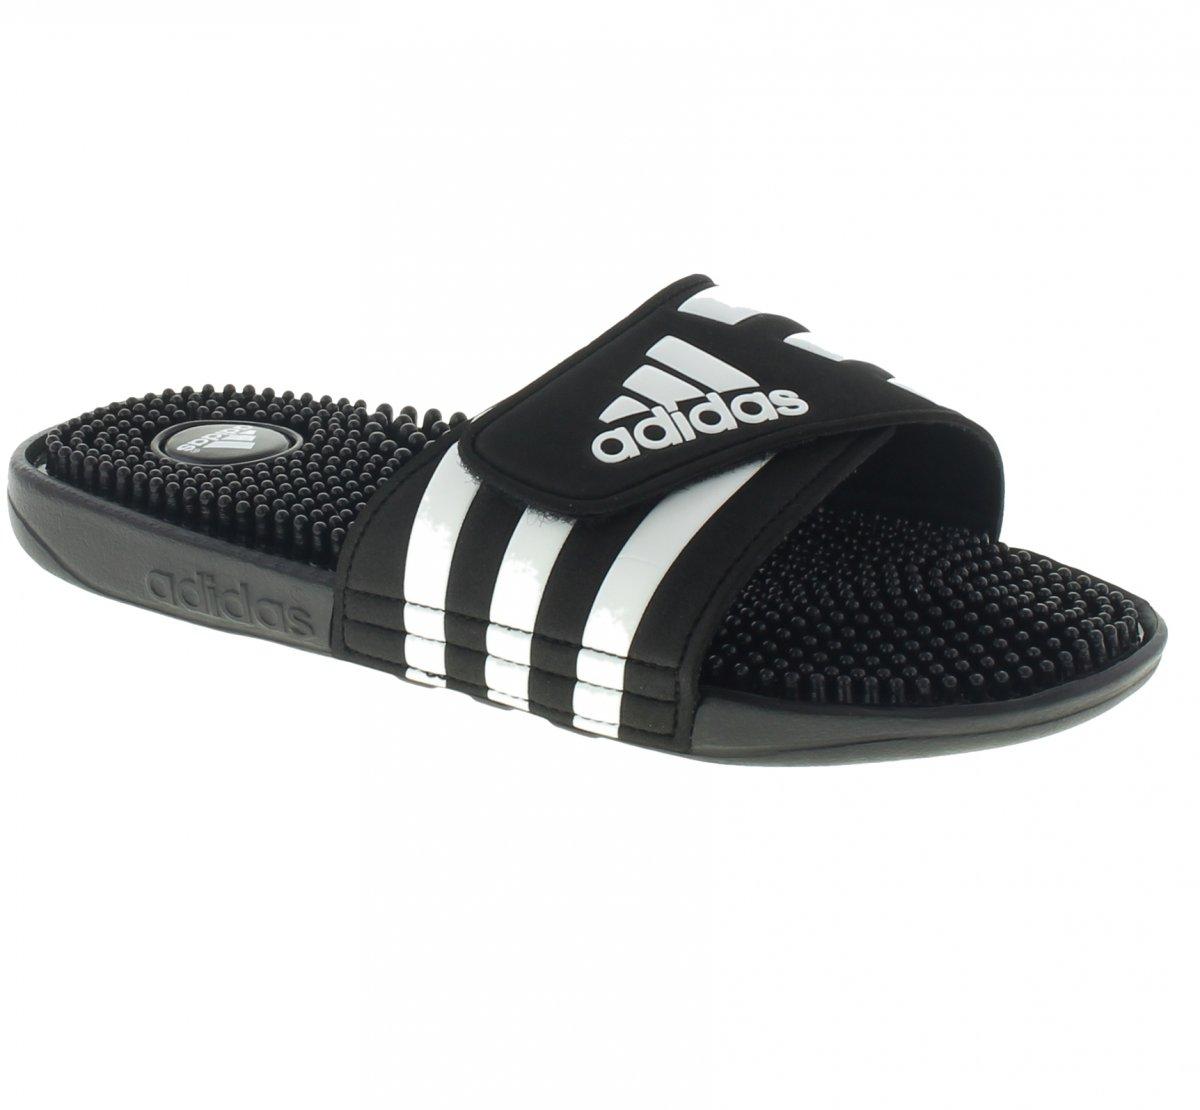 be8849859 Chinelo Adidas Adissage 078260 | Preto/branco | Coutope